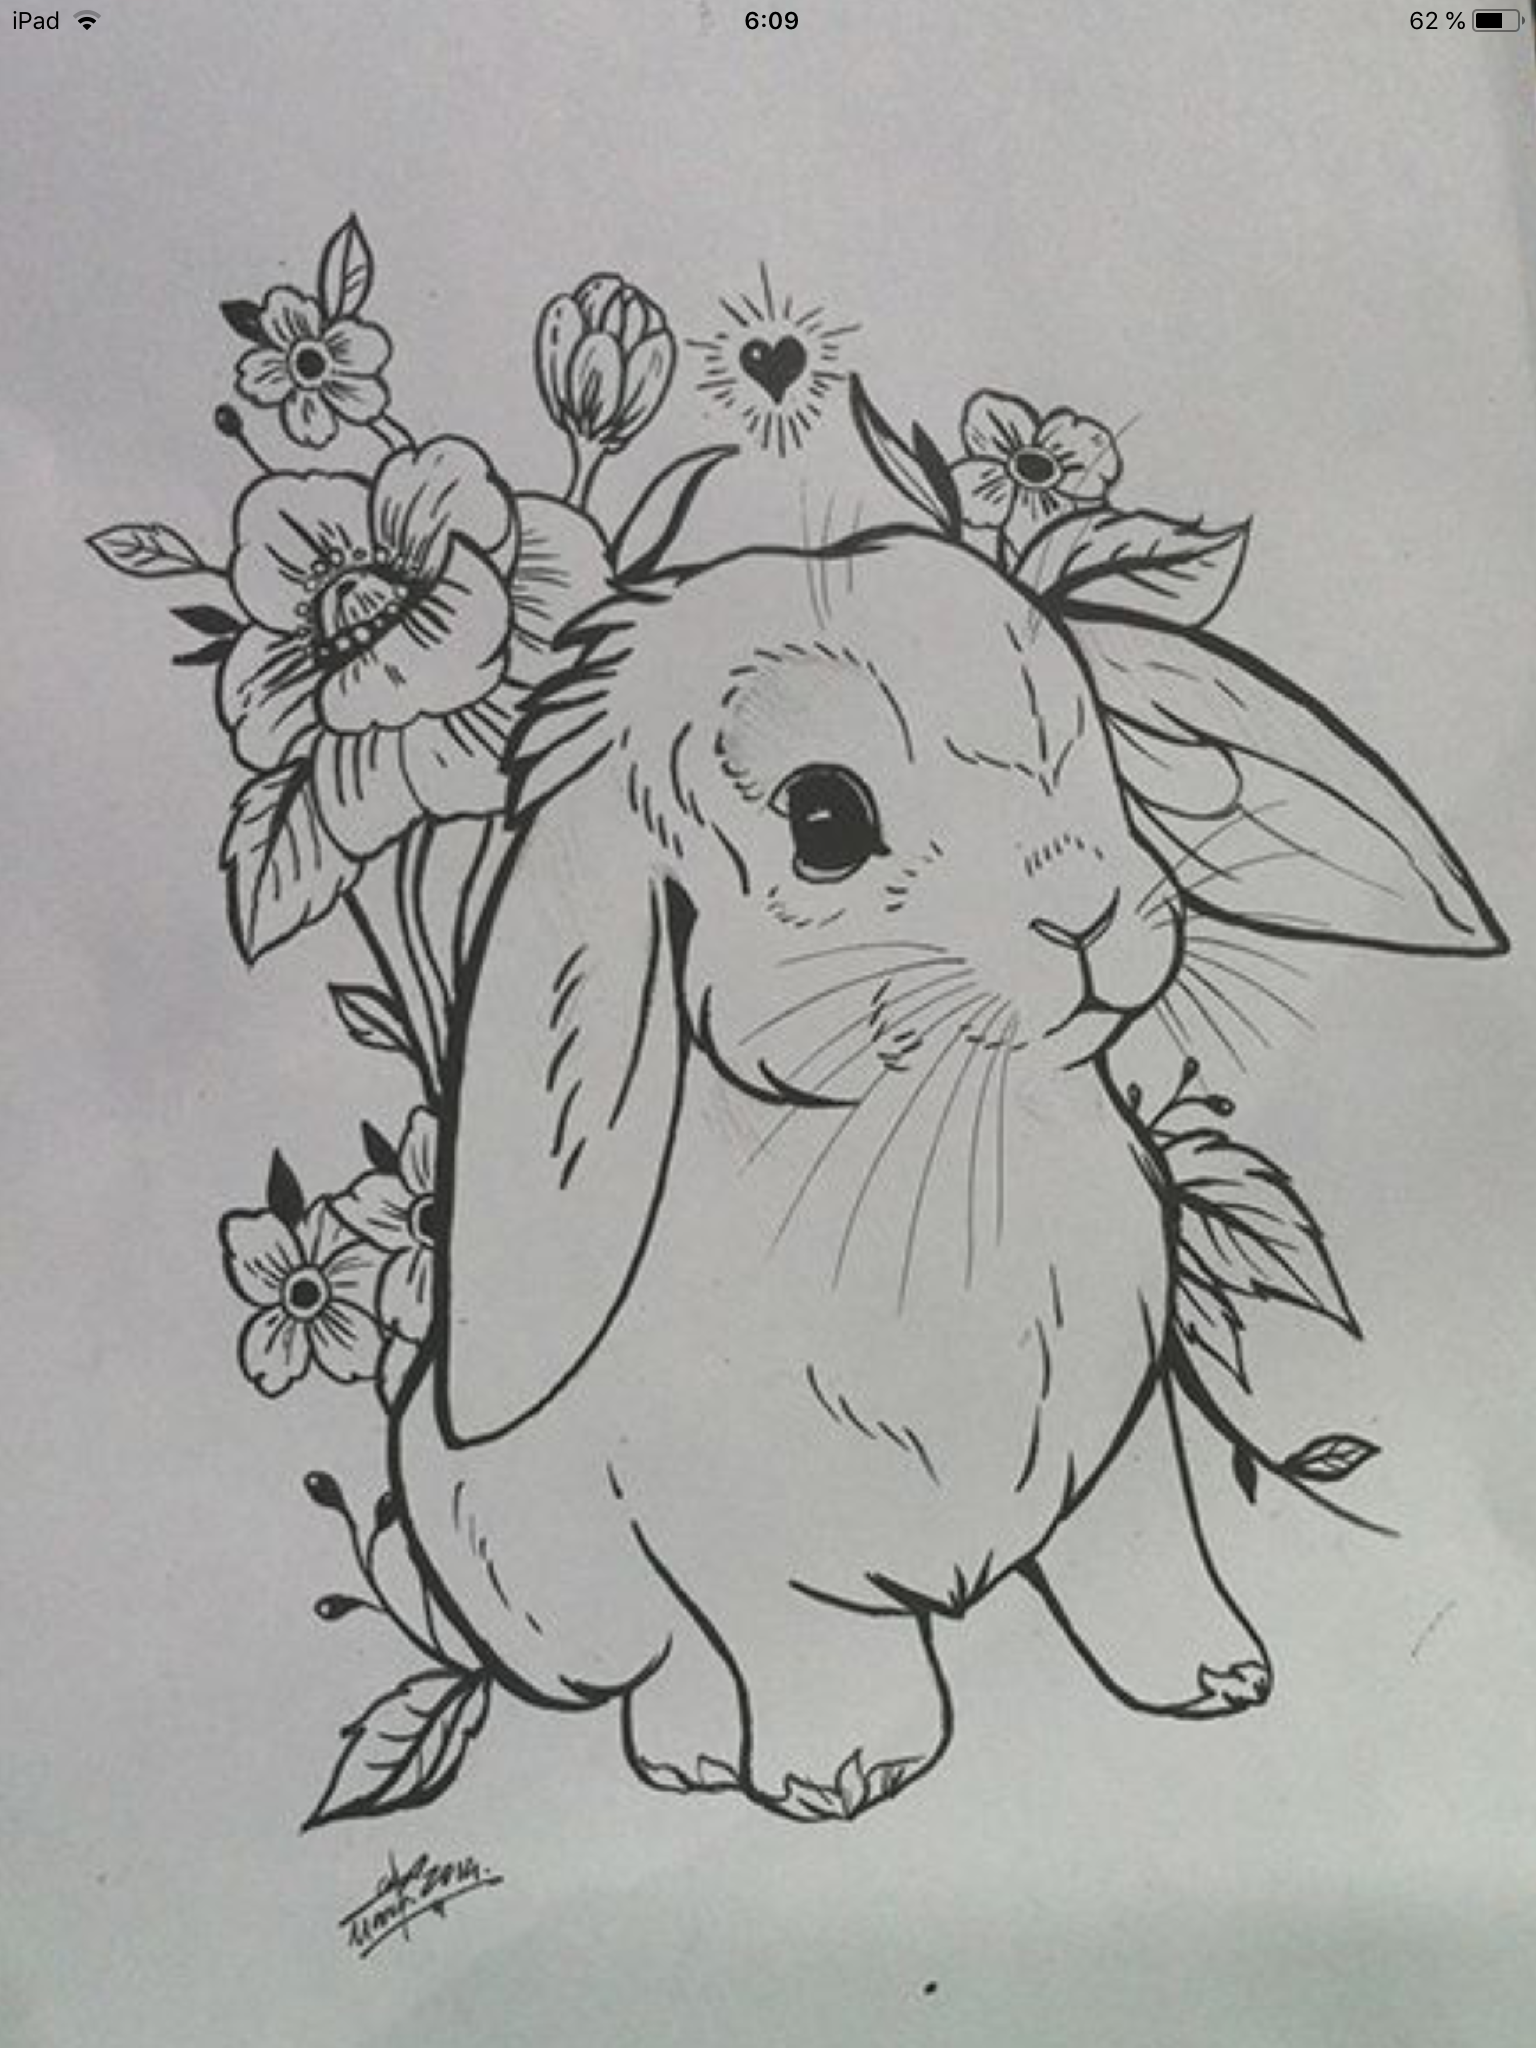 Process Of Creating My Rabbit Tattoo Design Tuesday 1st April 2014 Bunny Tattoos Rabbit Tattoos Bunny Art